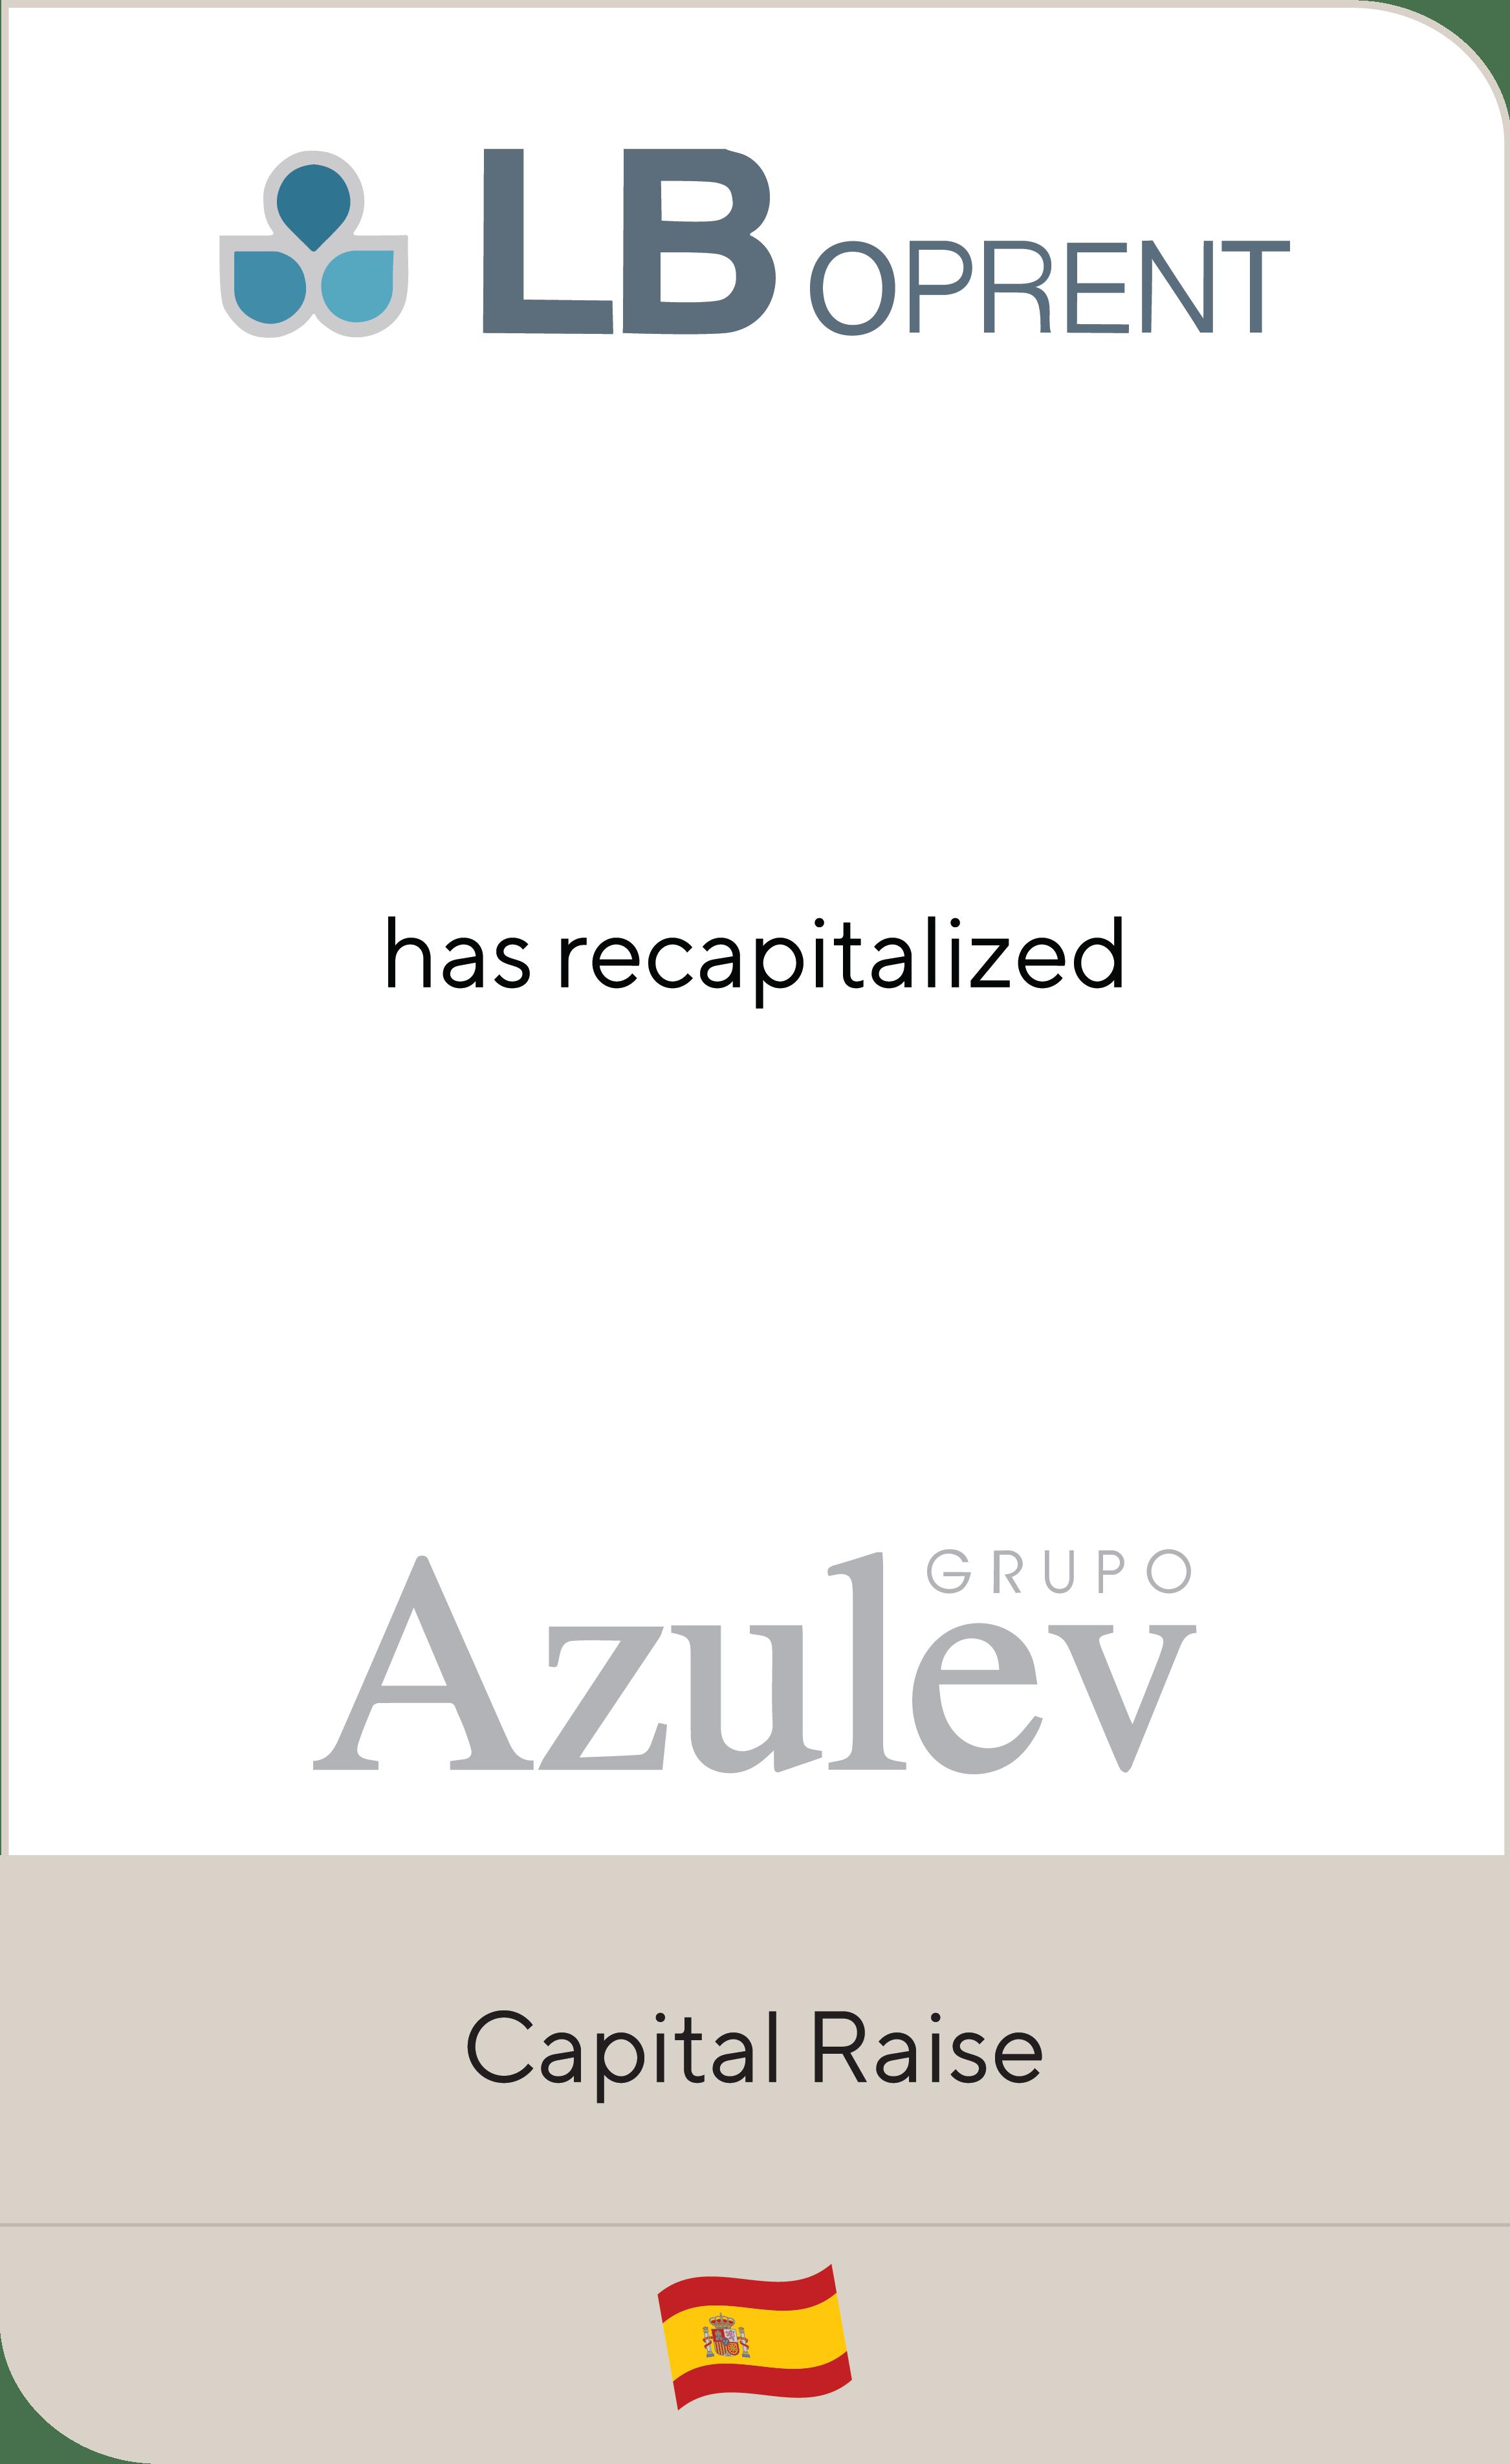 LB Oprent Azulev 2019